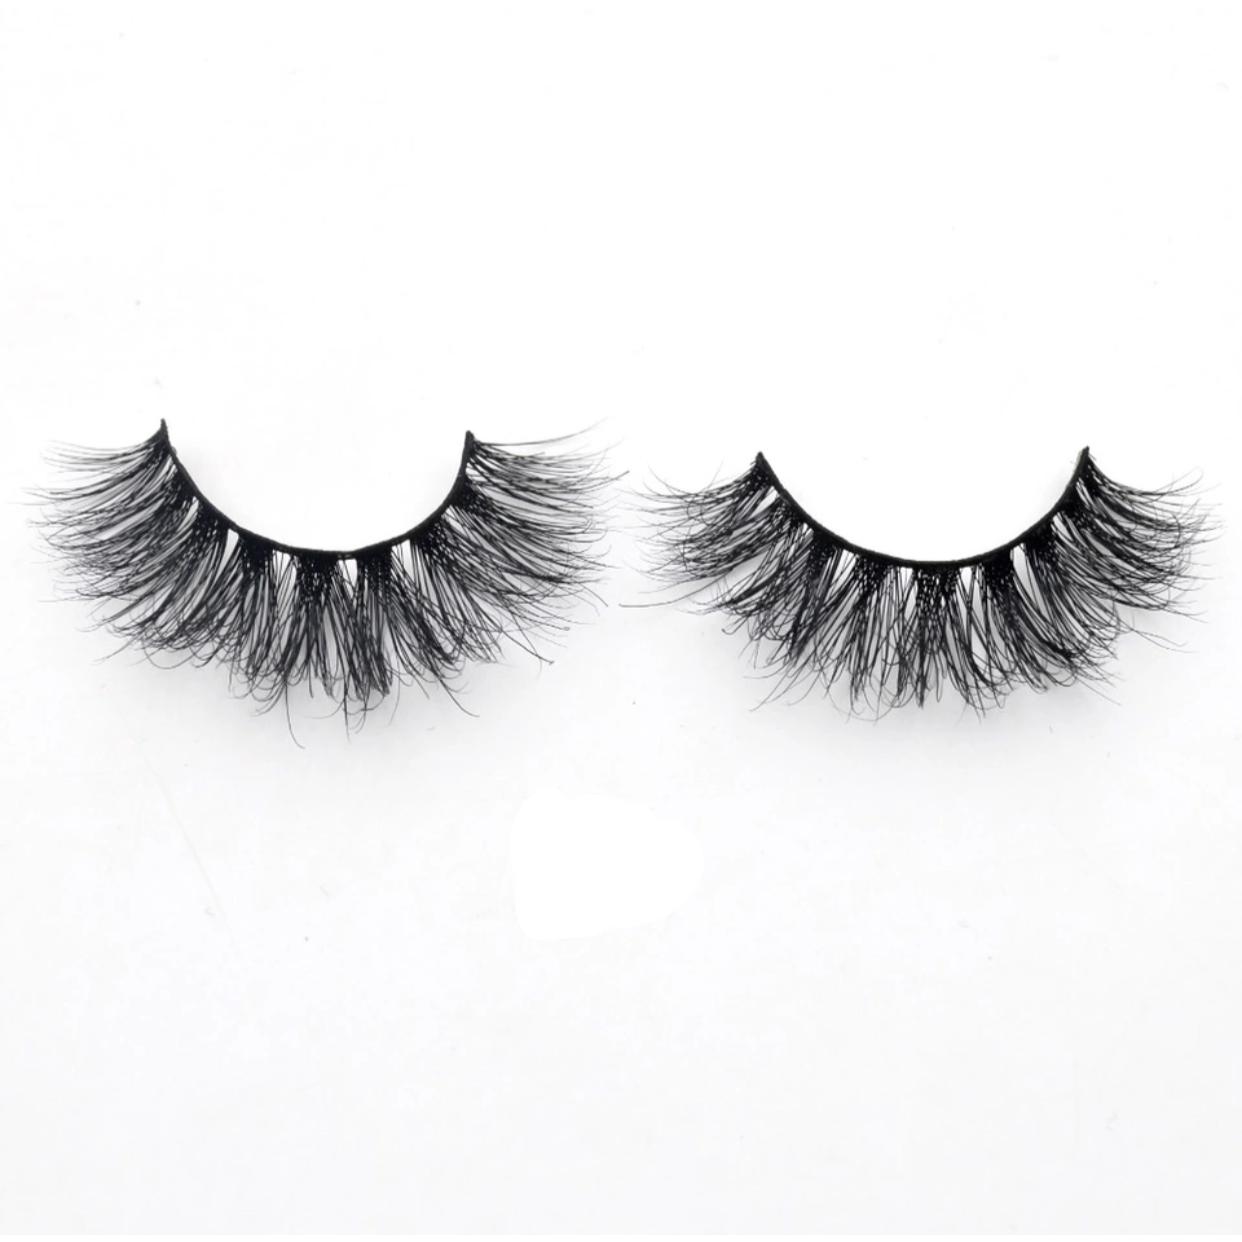 Lexi Noel Beauty: Girls Night Out 3D Mink Lashes   Rakuten.com